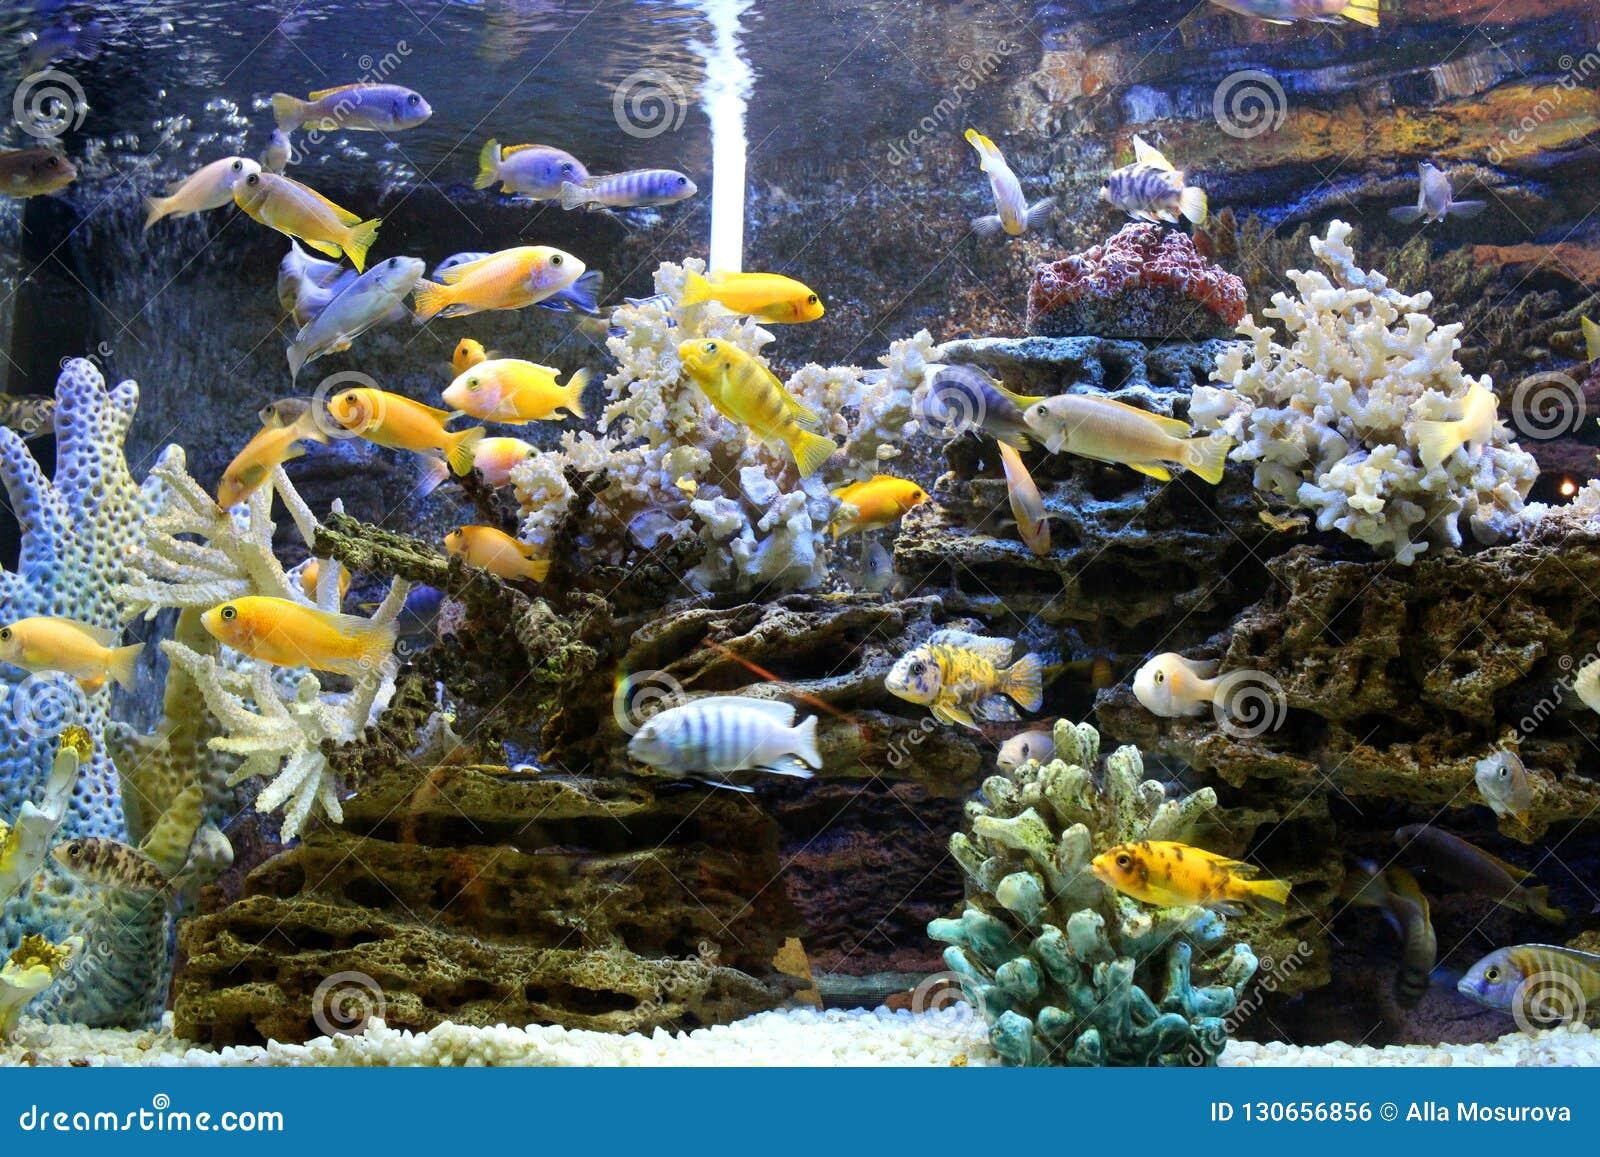 Beautiful gold sea fish swims in the aquarium